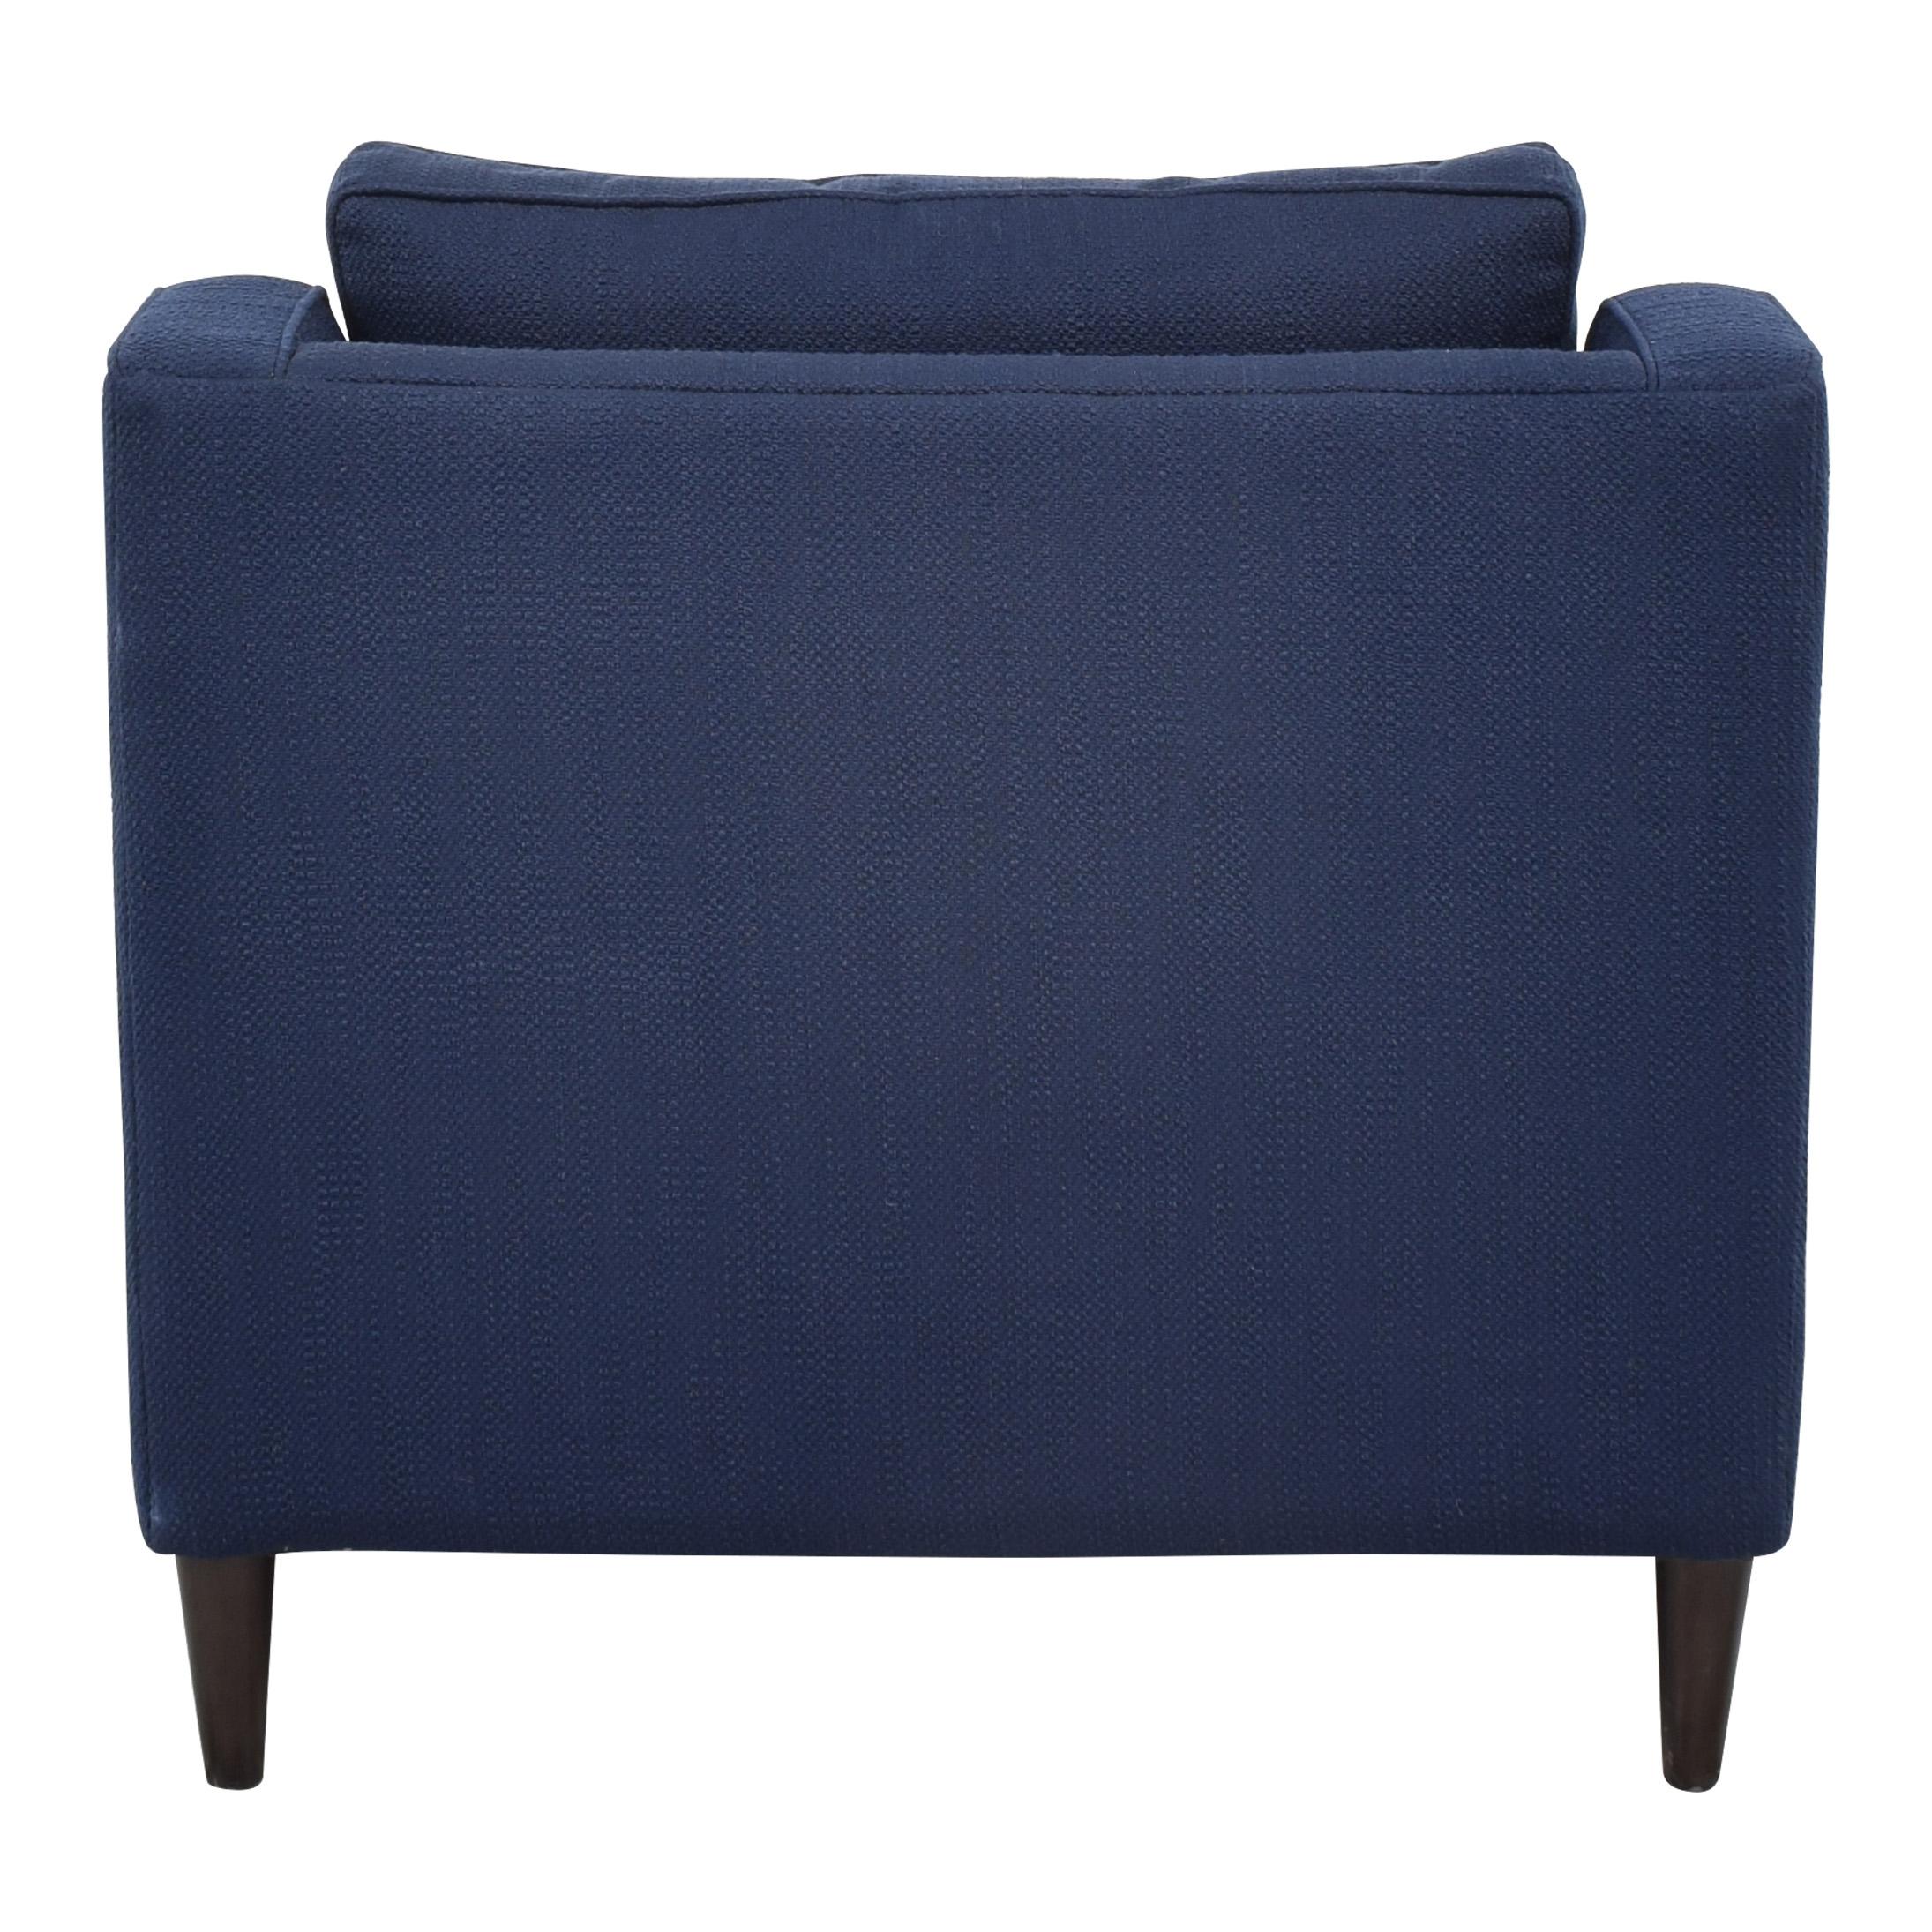 buy West Elm West Elm Paidge Chair online